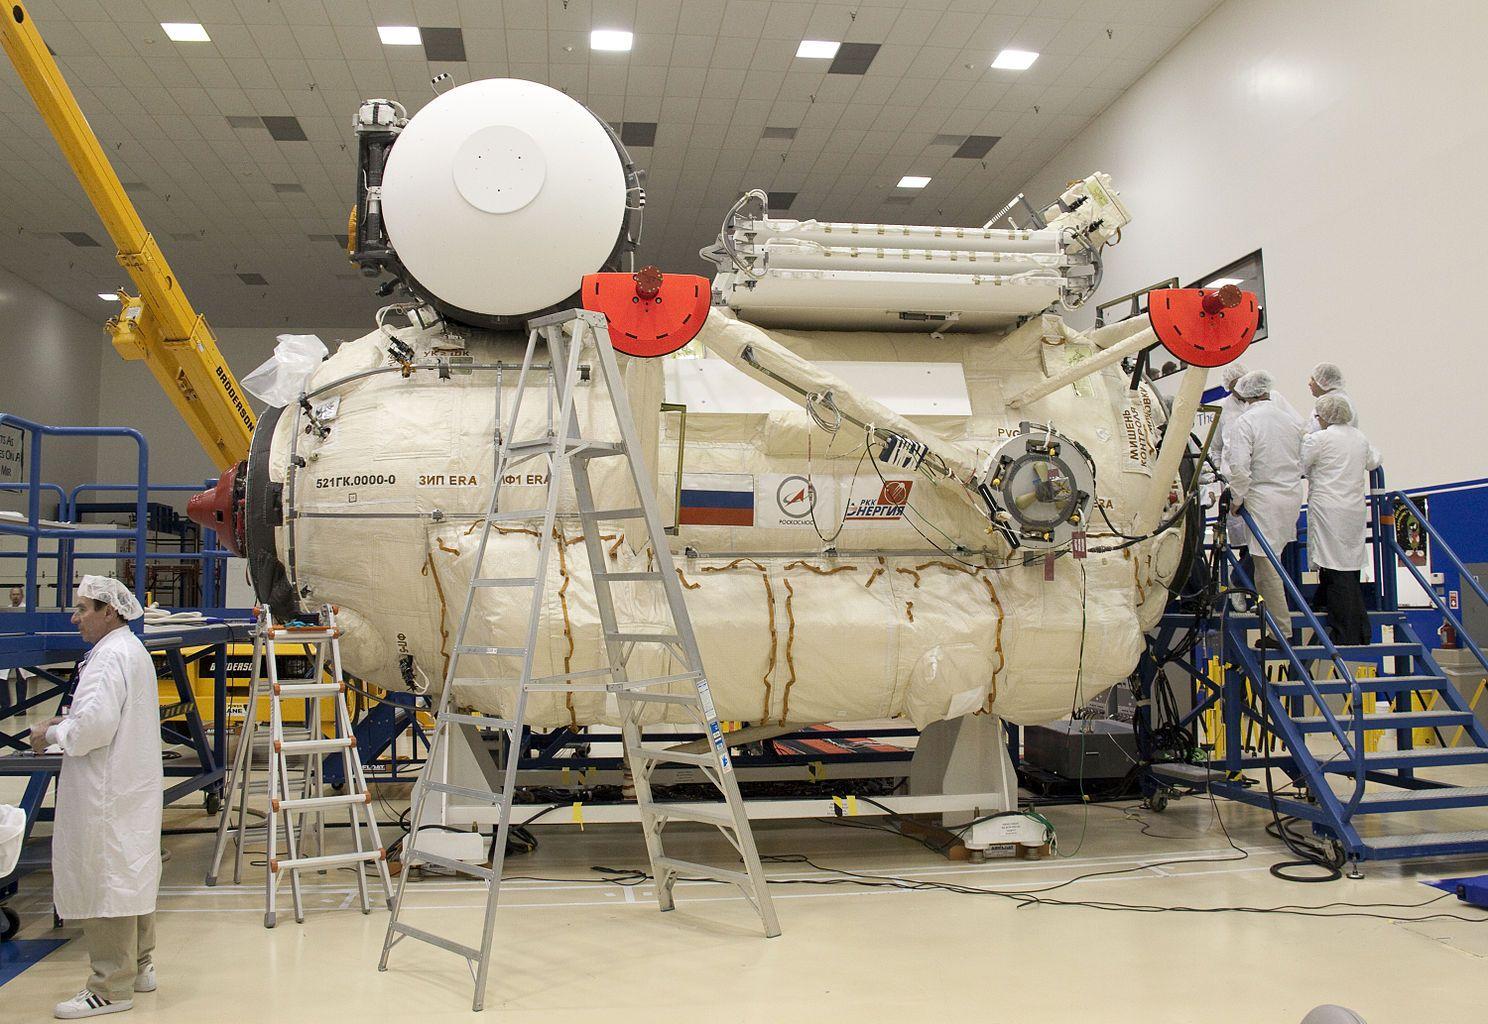 Rassvet Iss Module Iss Space Travel Spacecraft